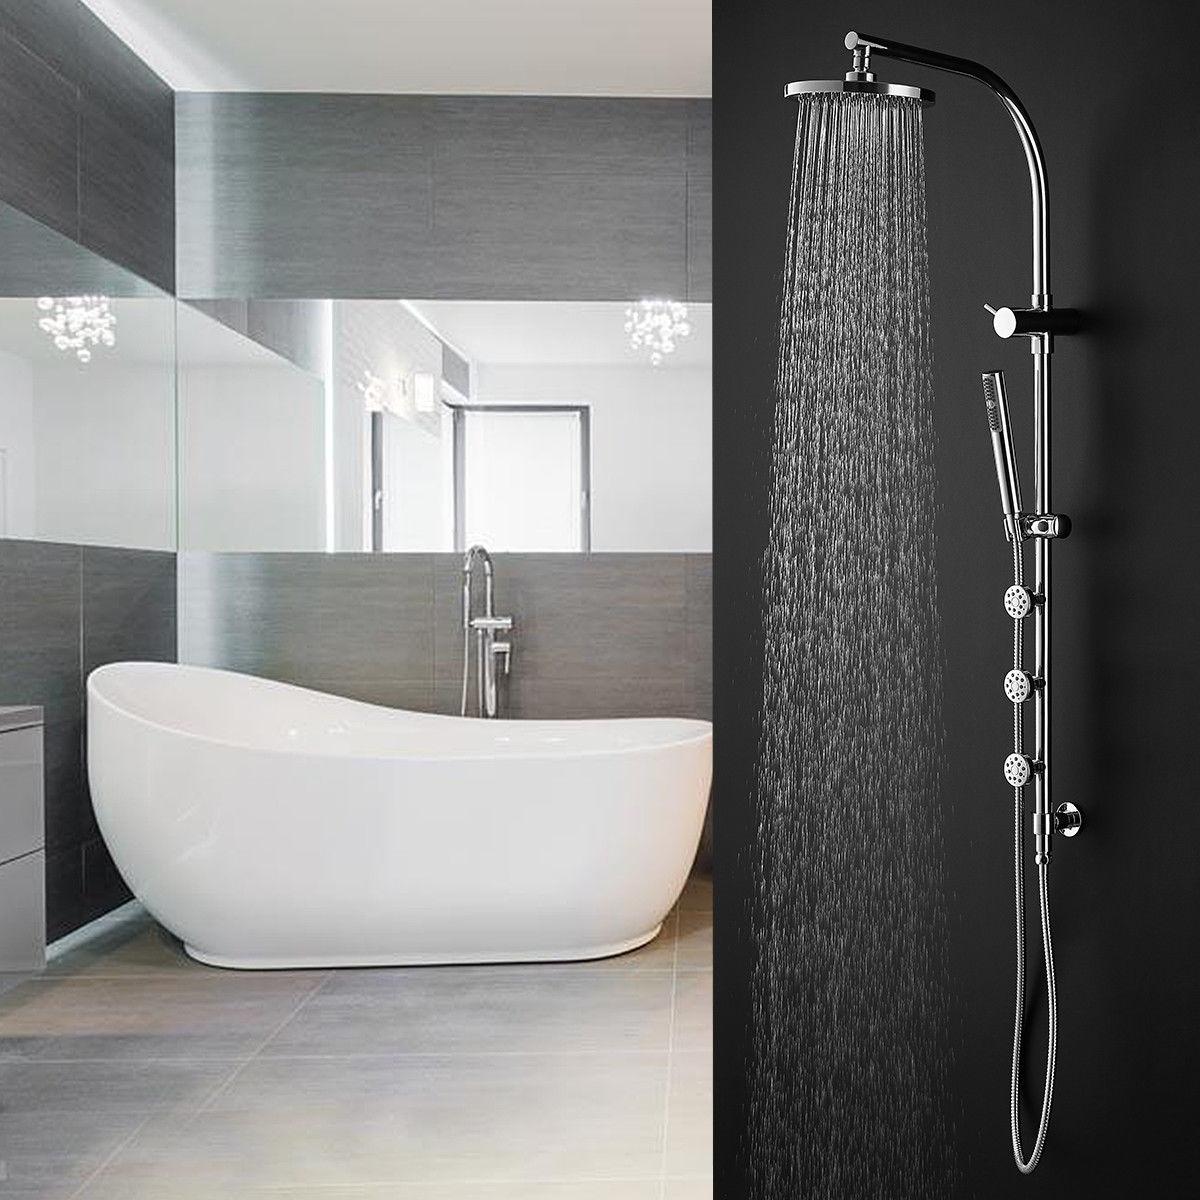 Shop Gymax 44\'\' Chrome Brass Rainfall Shower Panel Wall Mount w/Hand ...